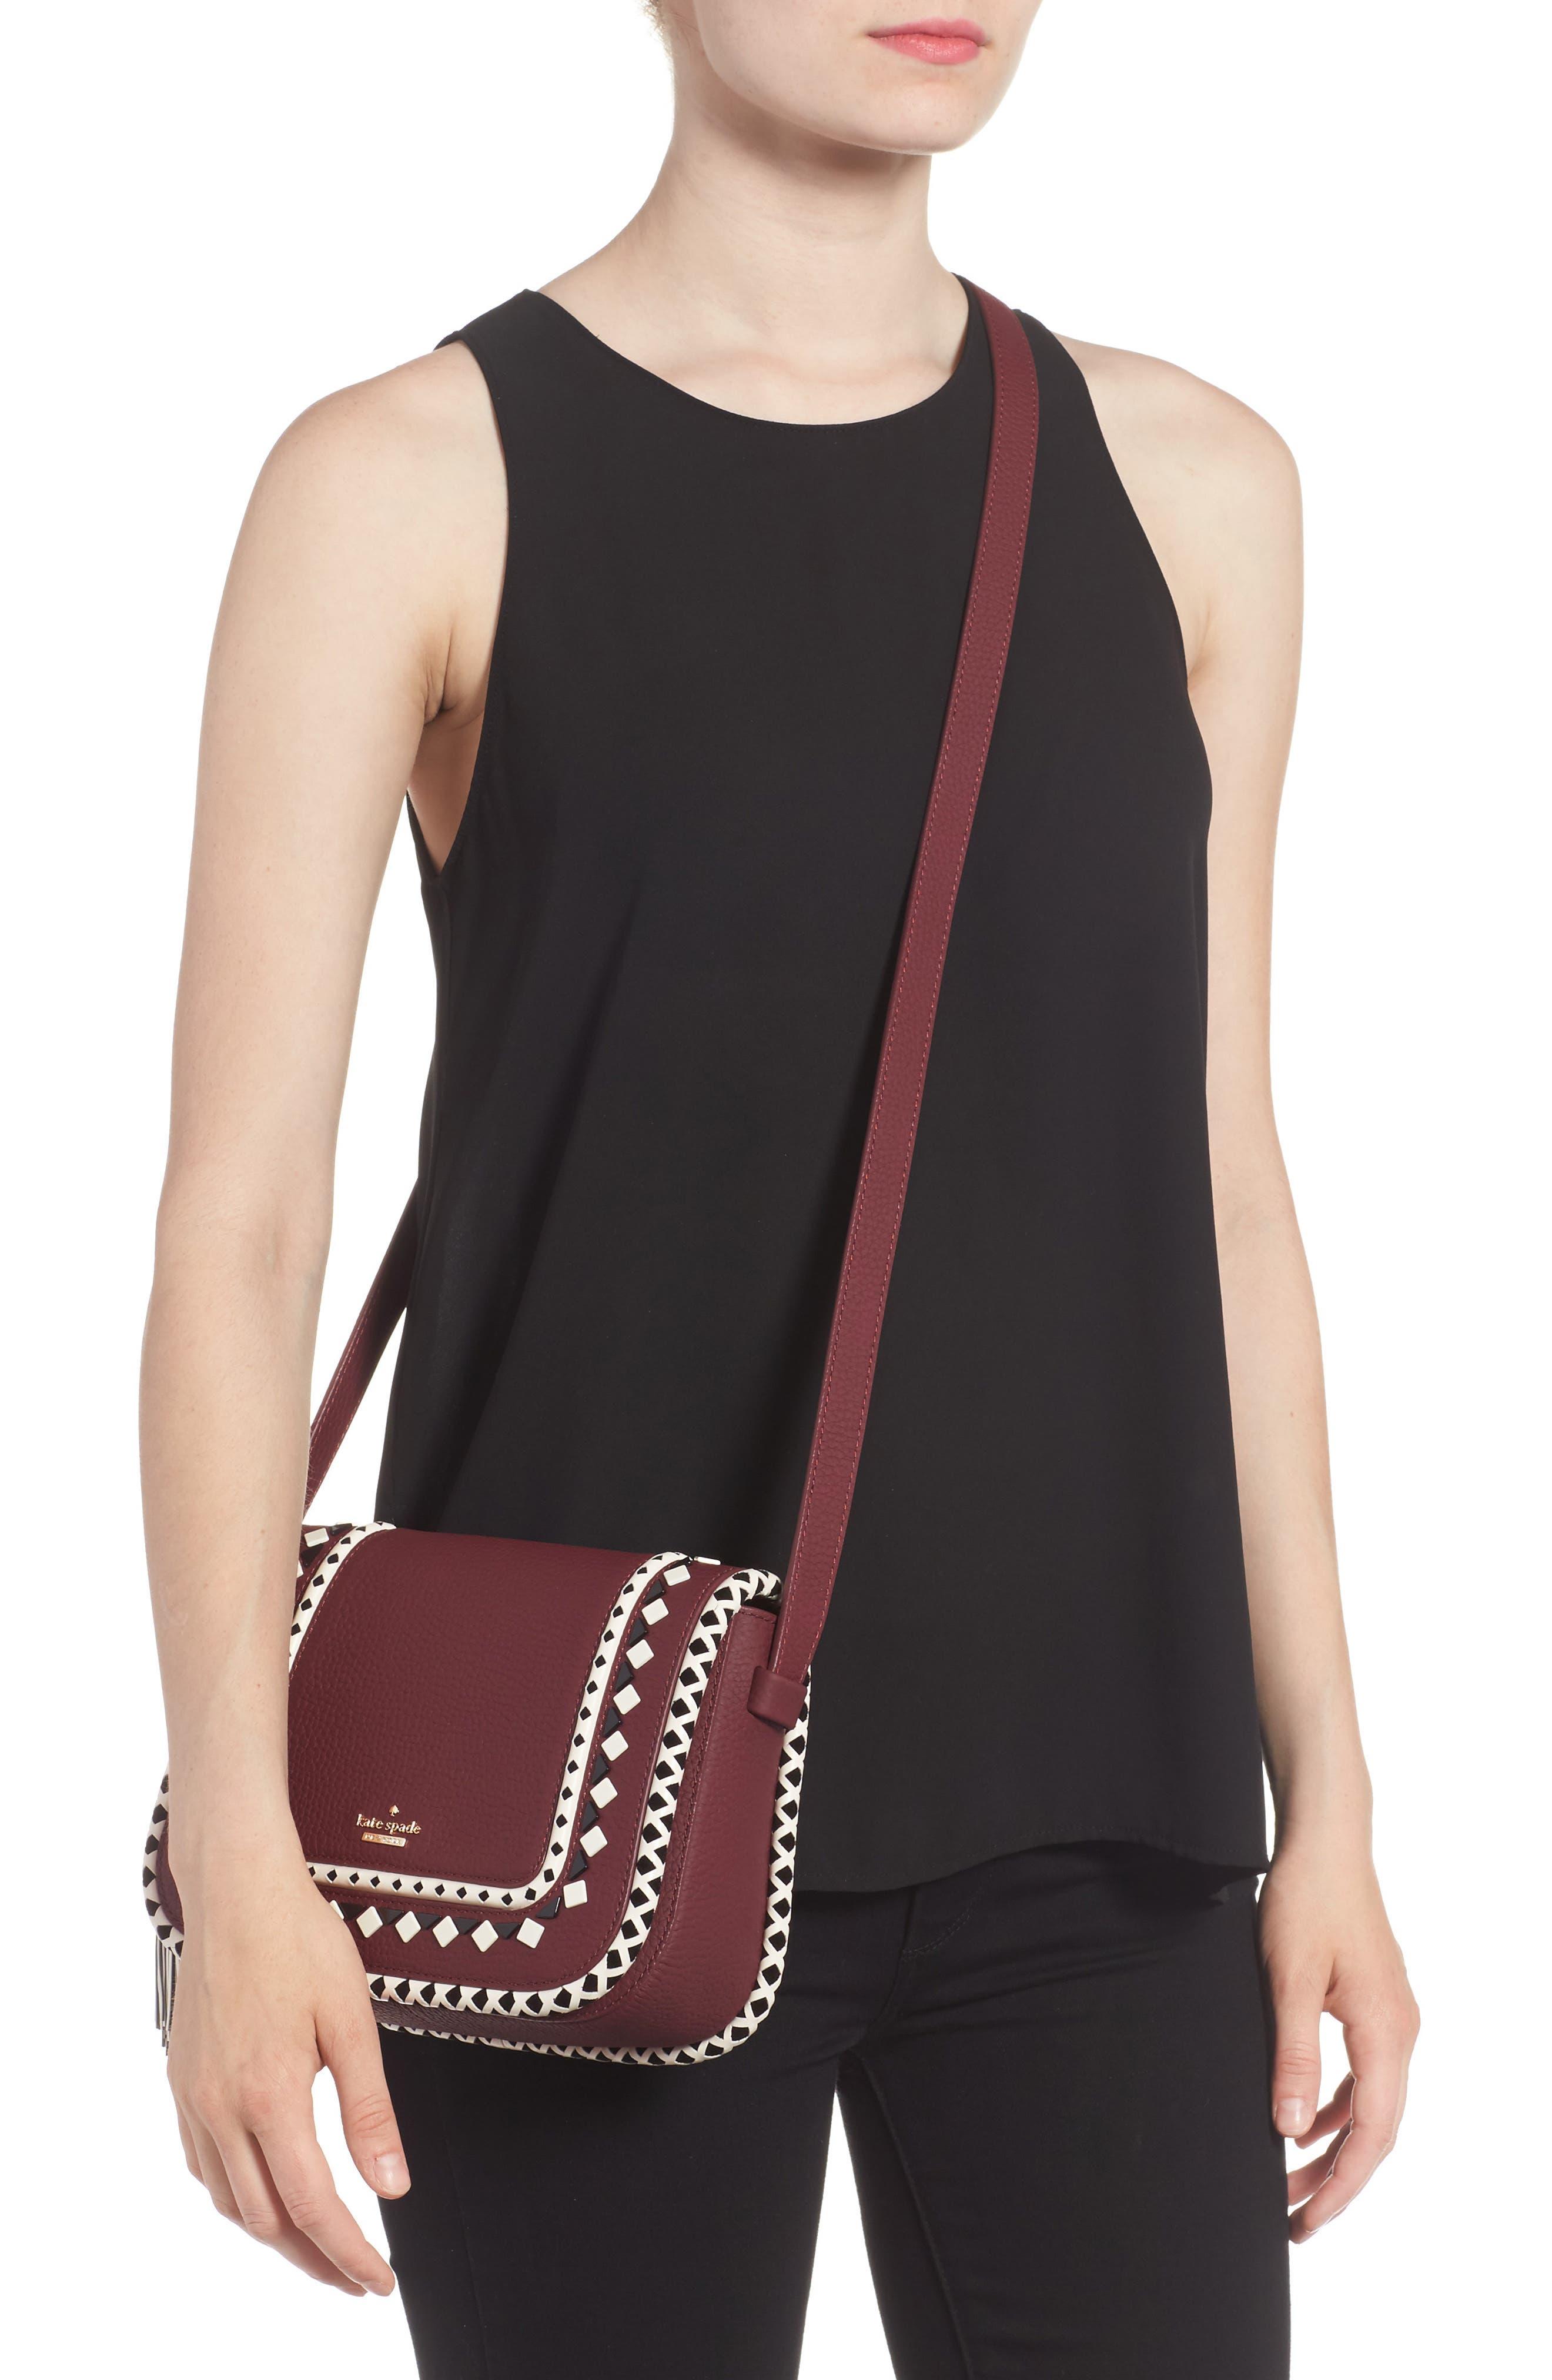 crown street - jasper leather saddle bag,                             Alternate thumbnail 4, color,